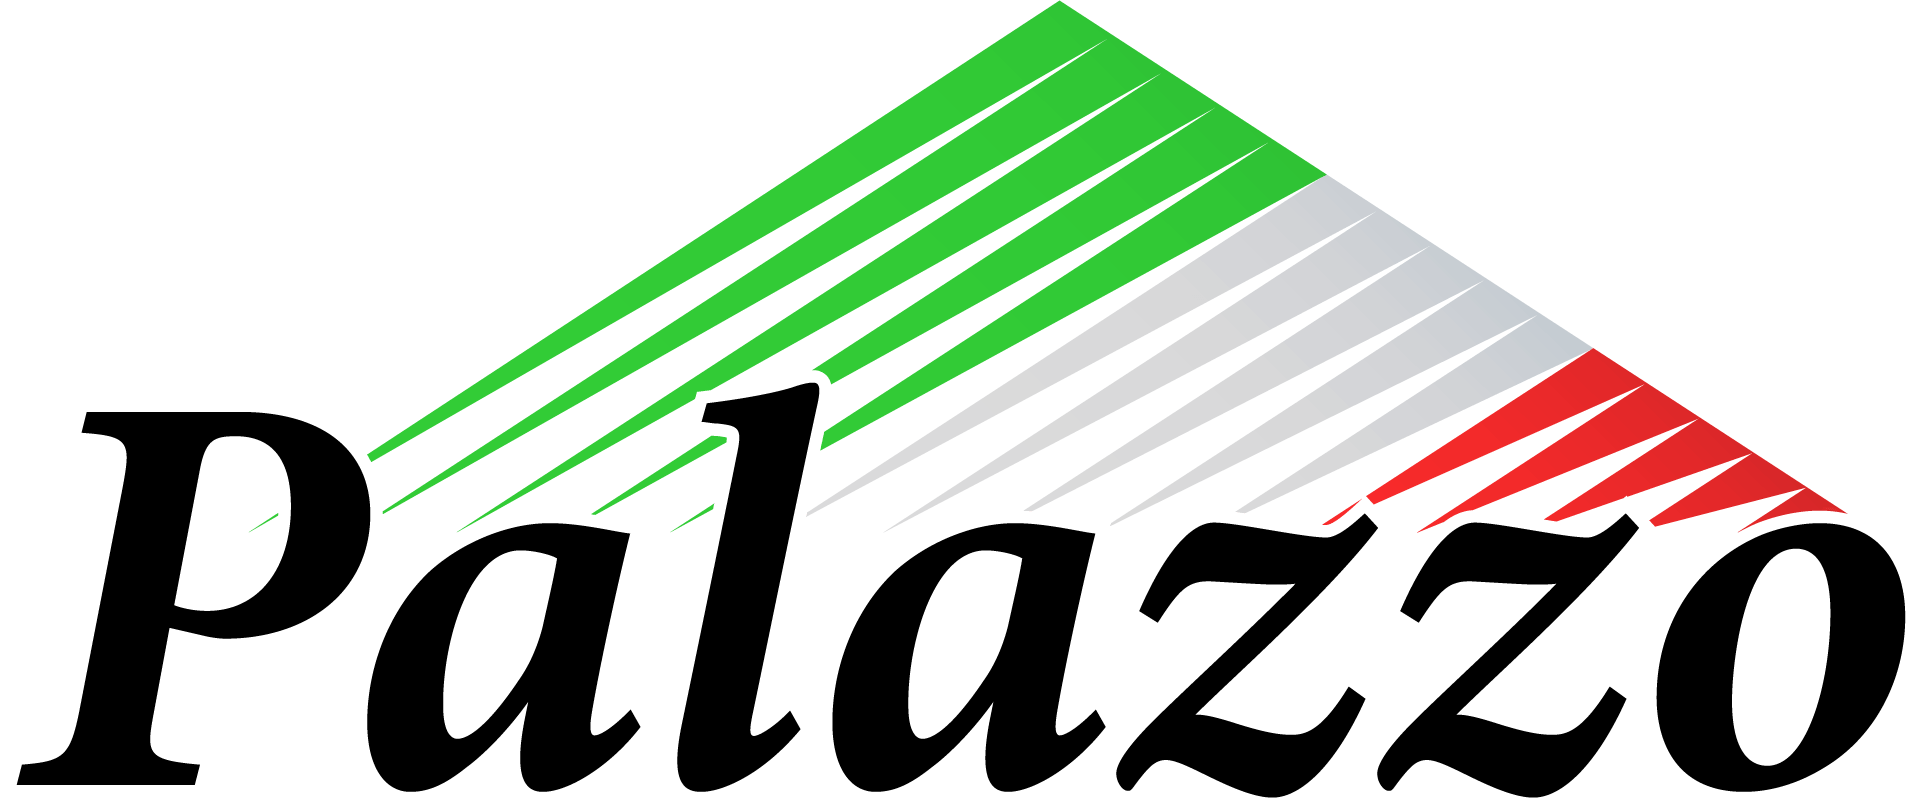 Logo Ristorante Palazzo © www.arenz-media.de 2019